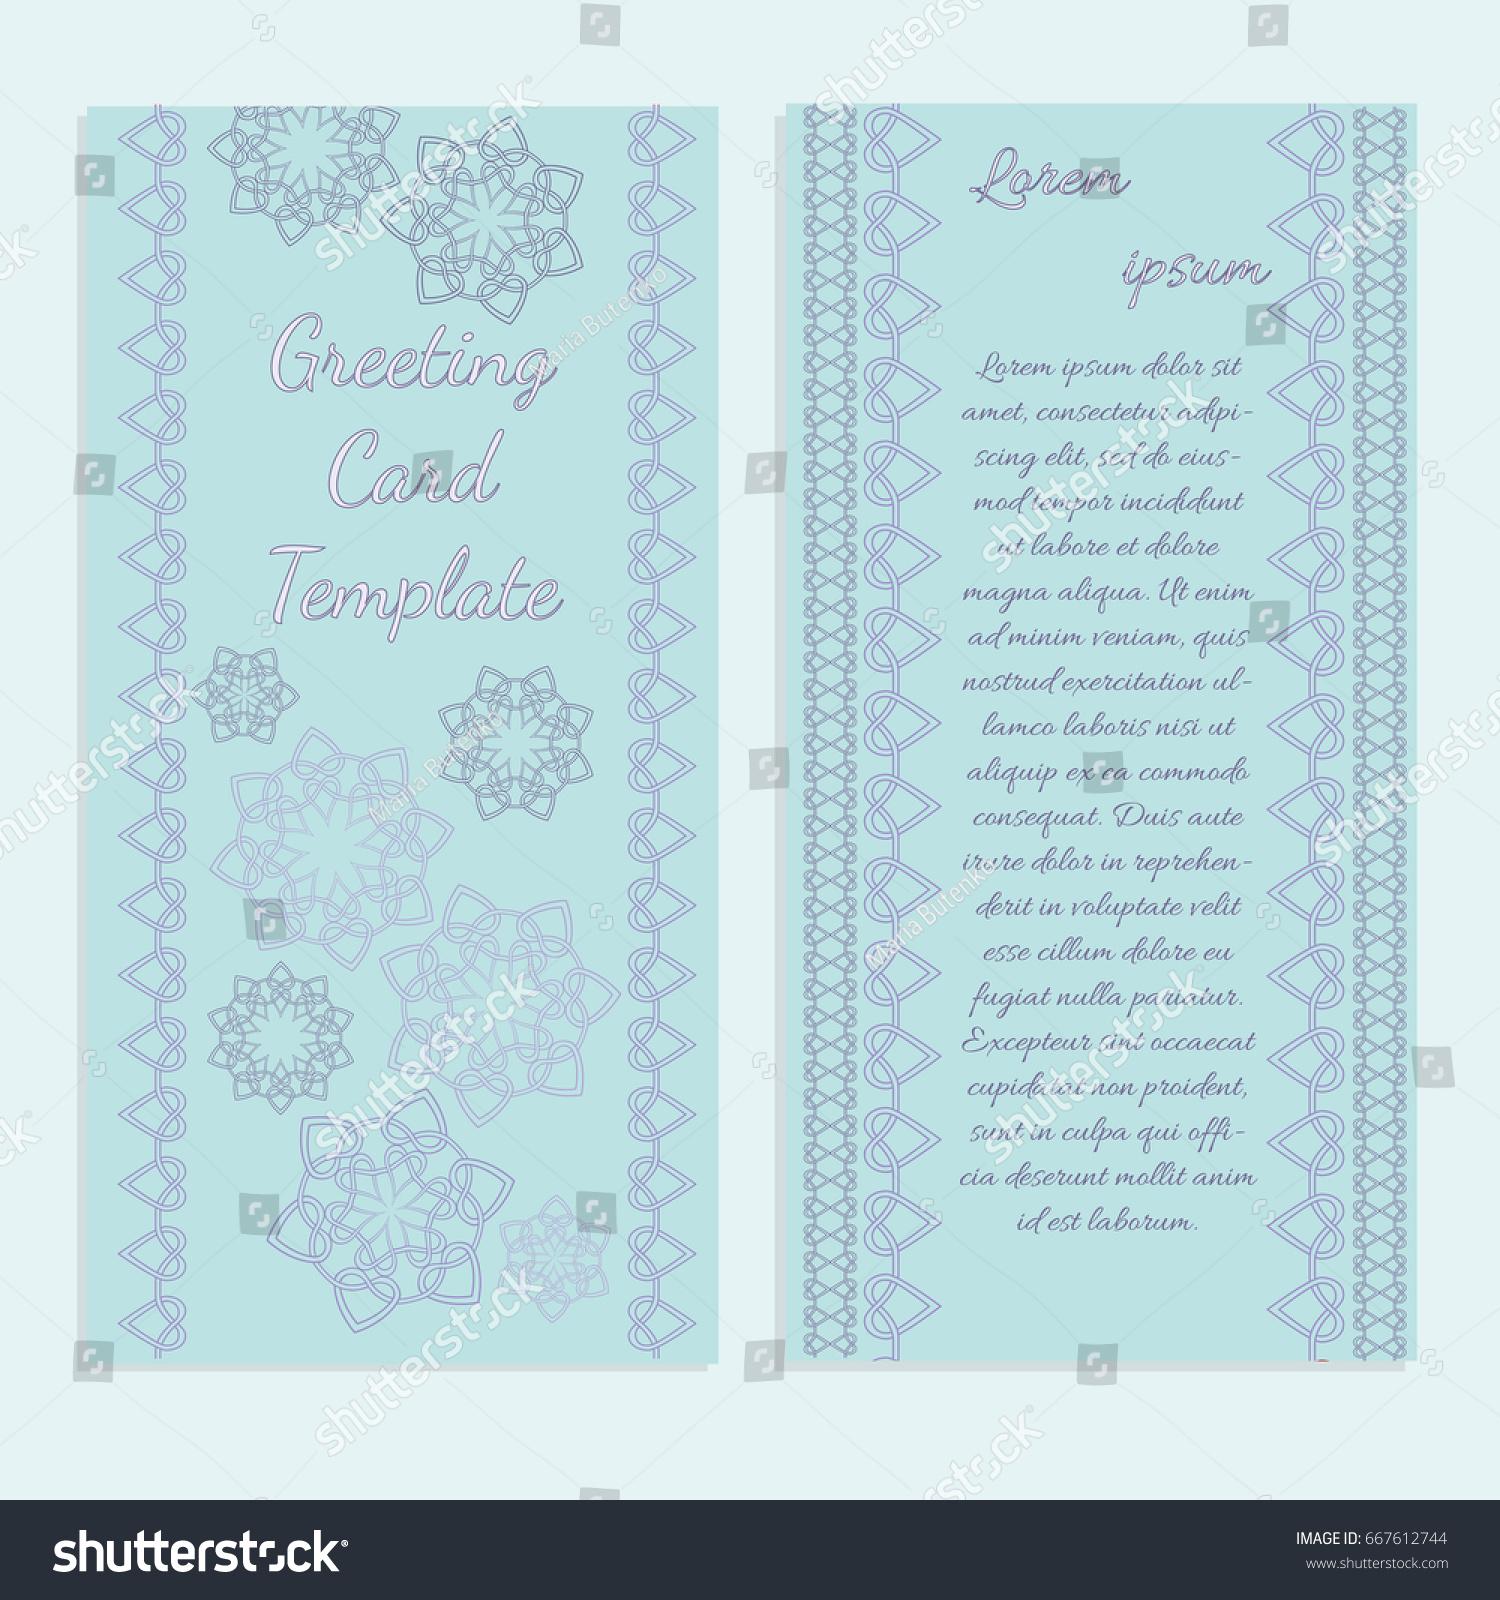 templates greeting wedding invitation cards brochures stock vector